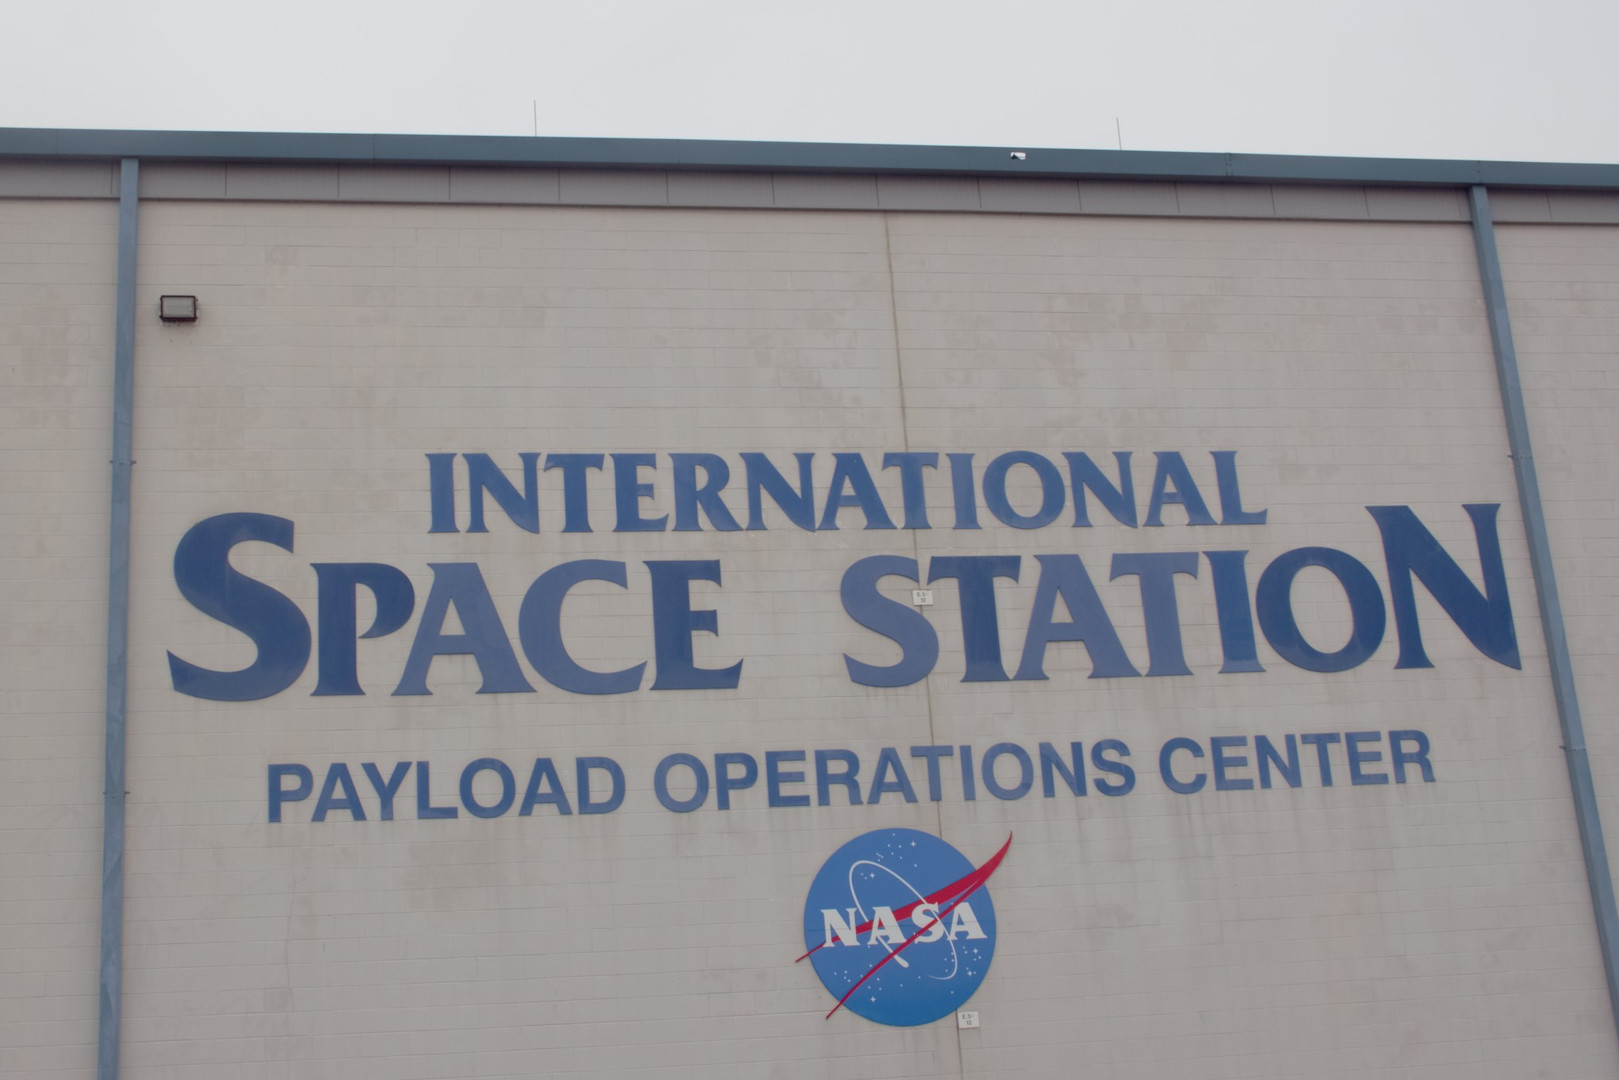 NASAsign2.jpg